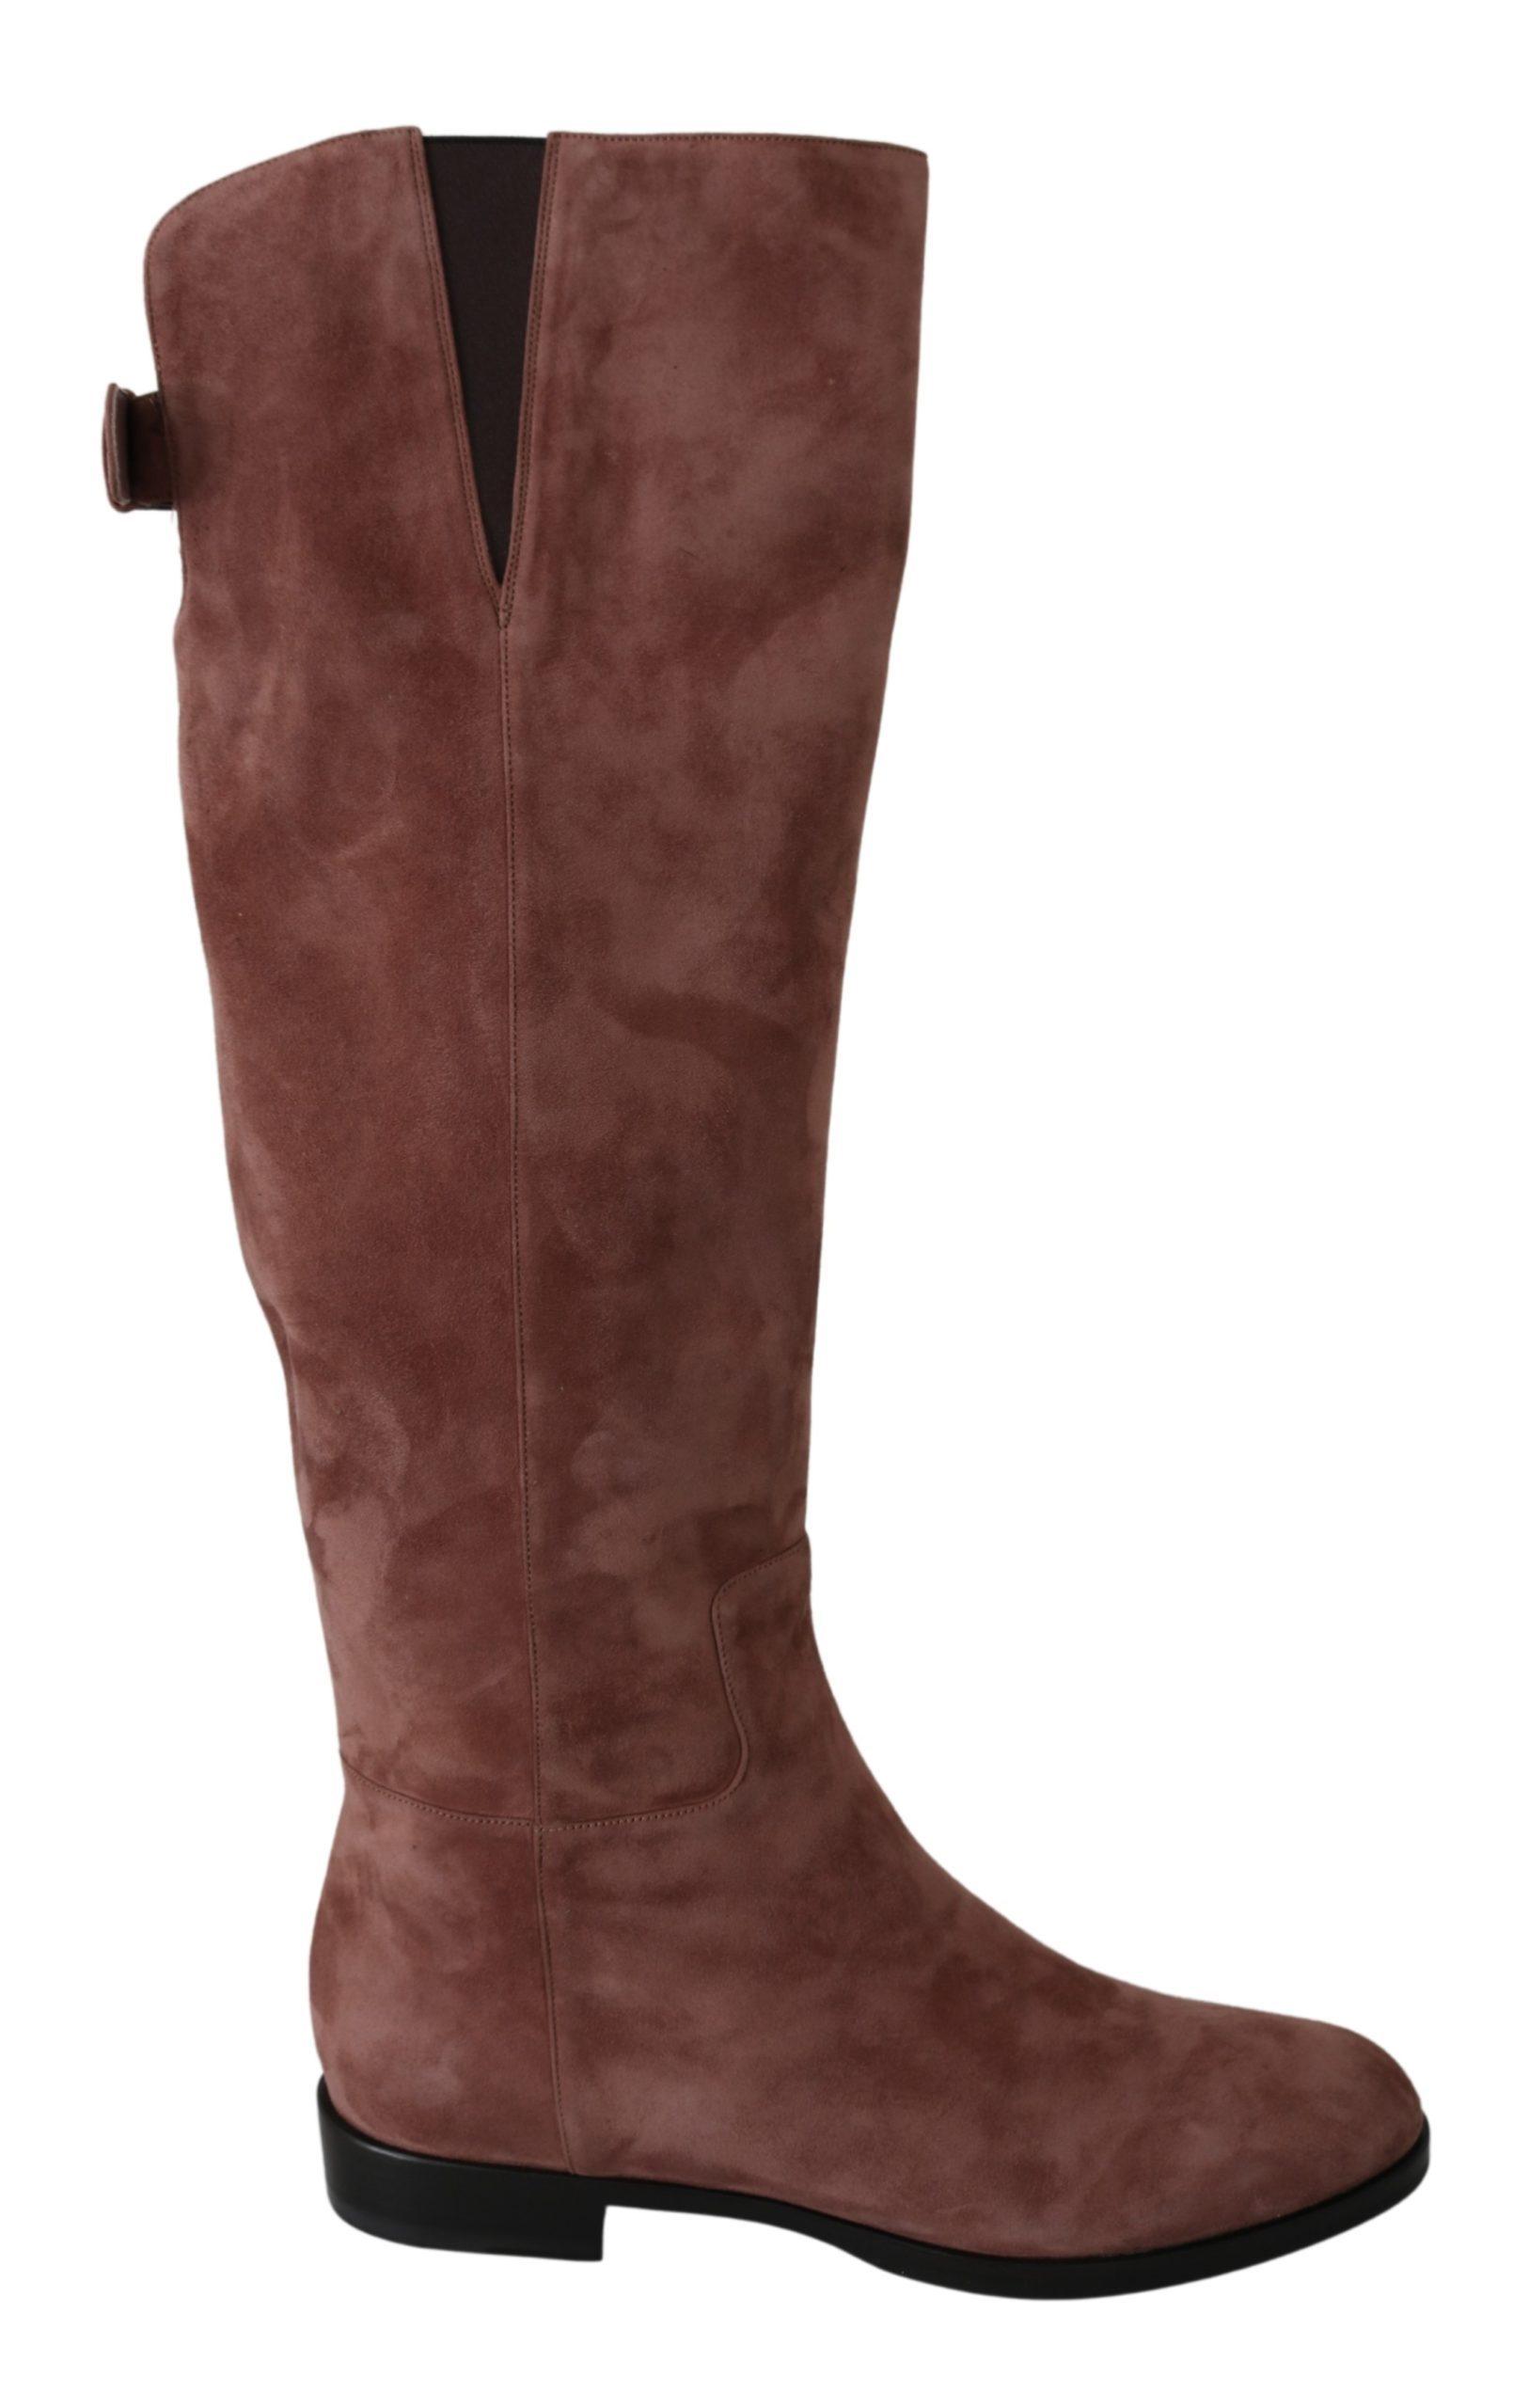 Dolce & Gabbana Women's Leather Suede Boots Beige LA6693-39 - EU39/US8.5